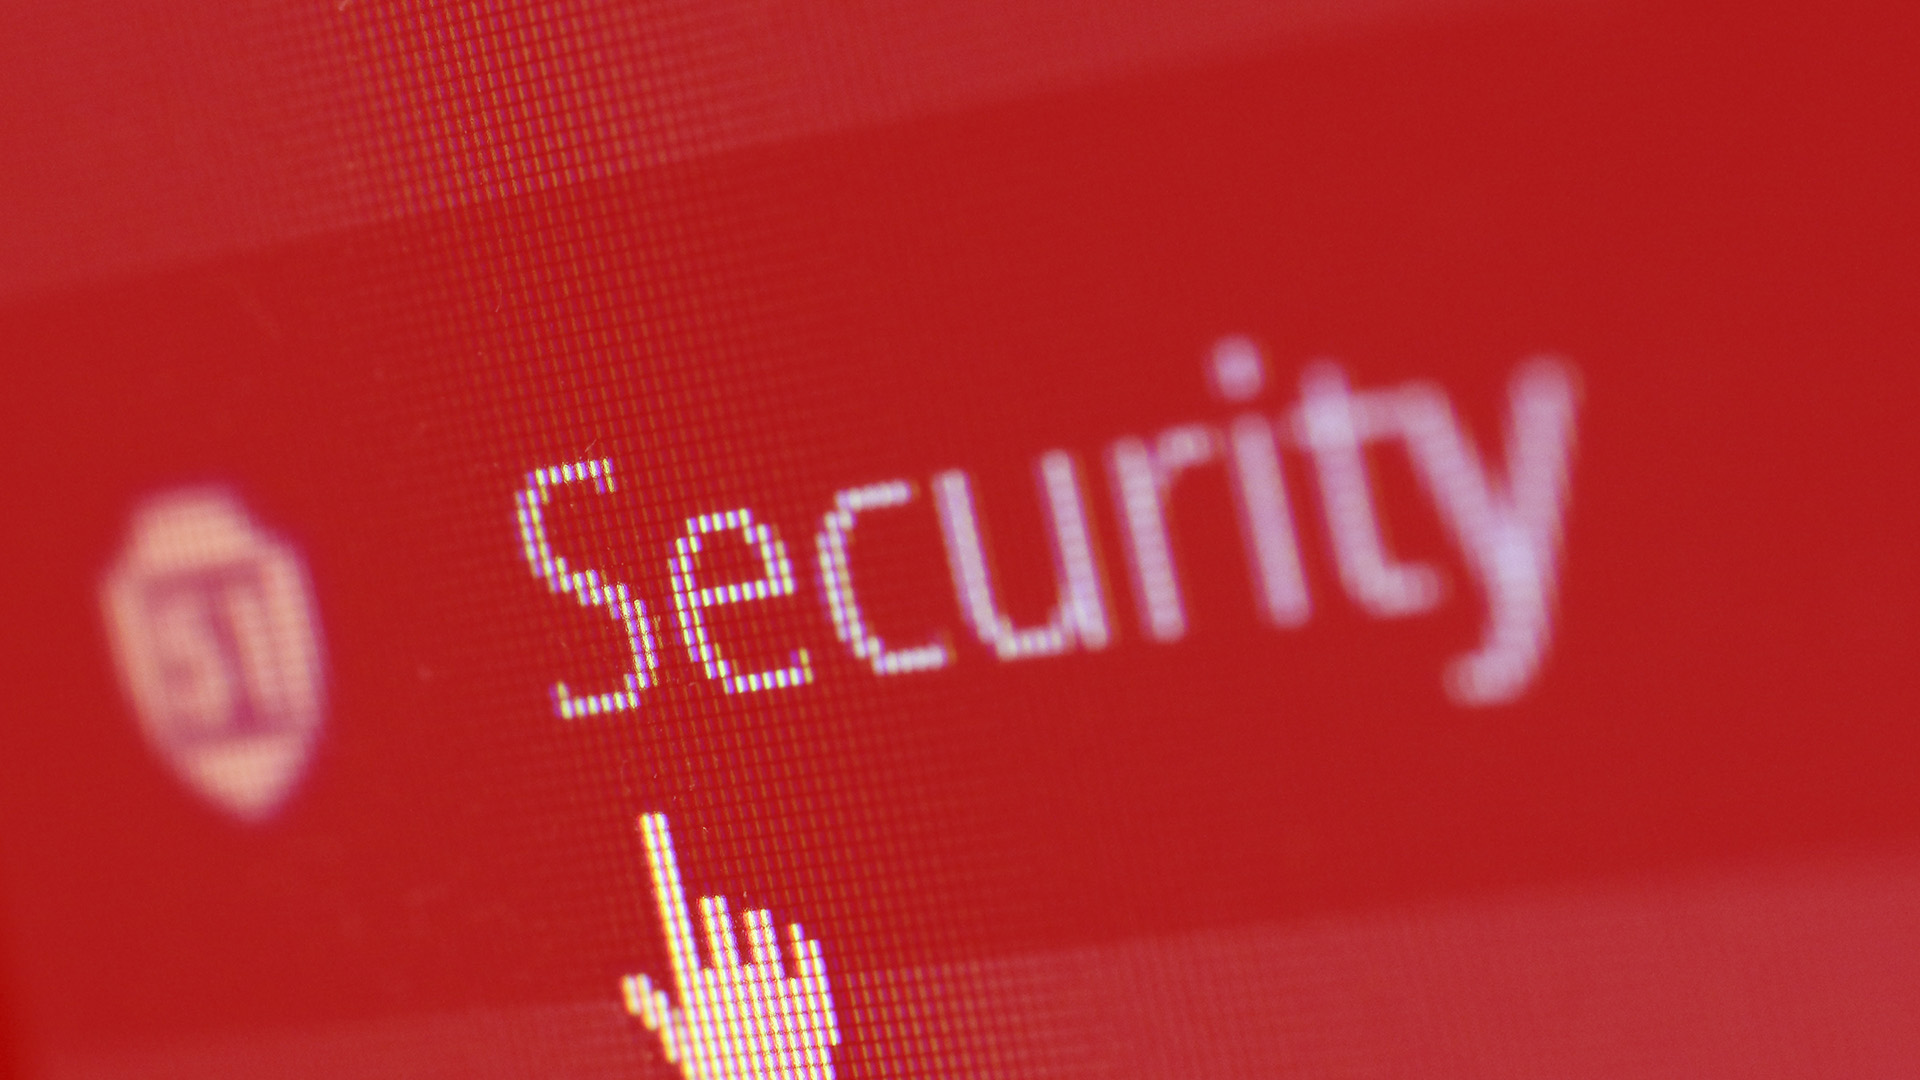 Improve your website security